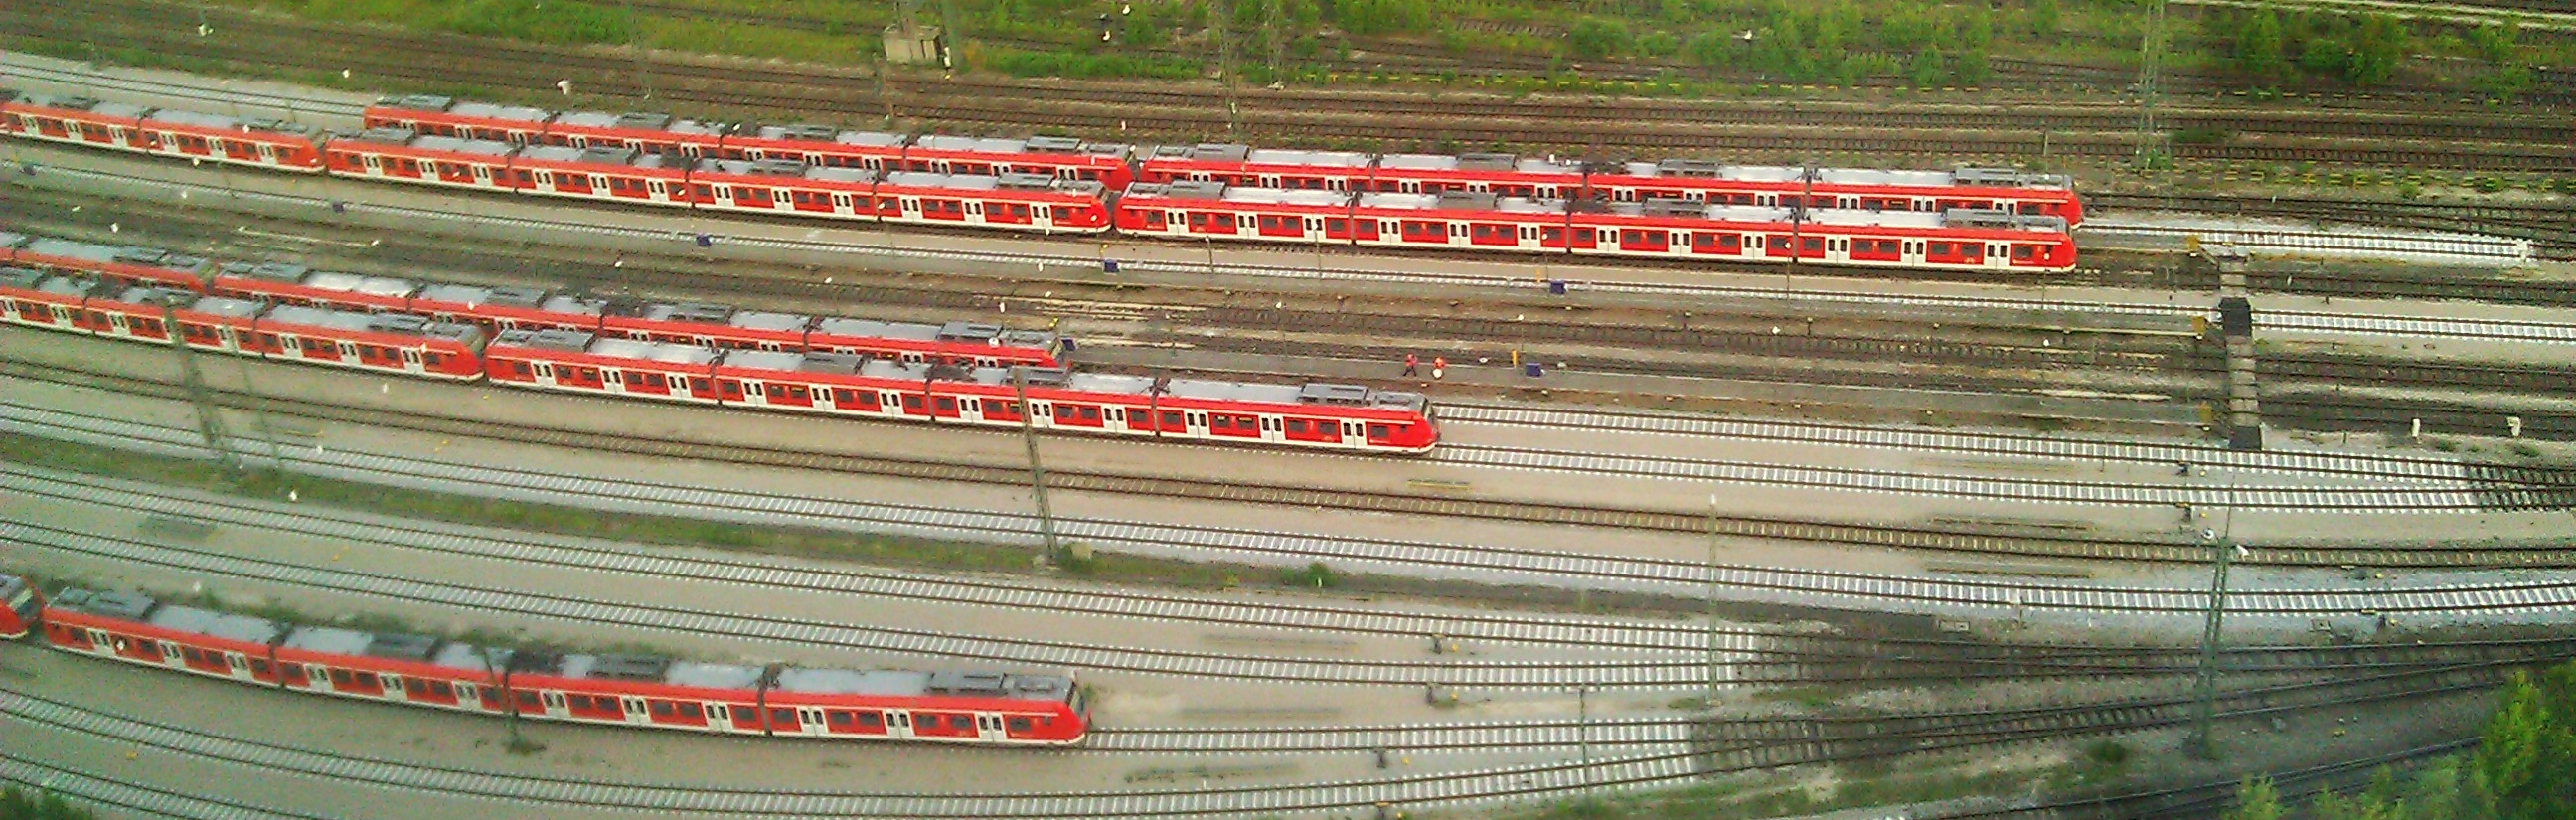 S-Bahnen aus dem 26. Stock